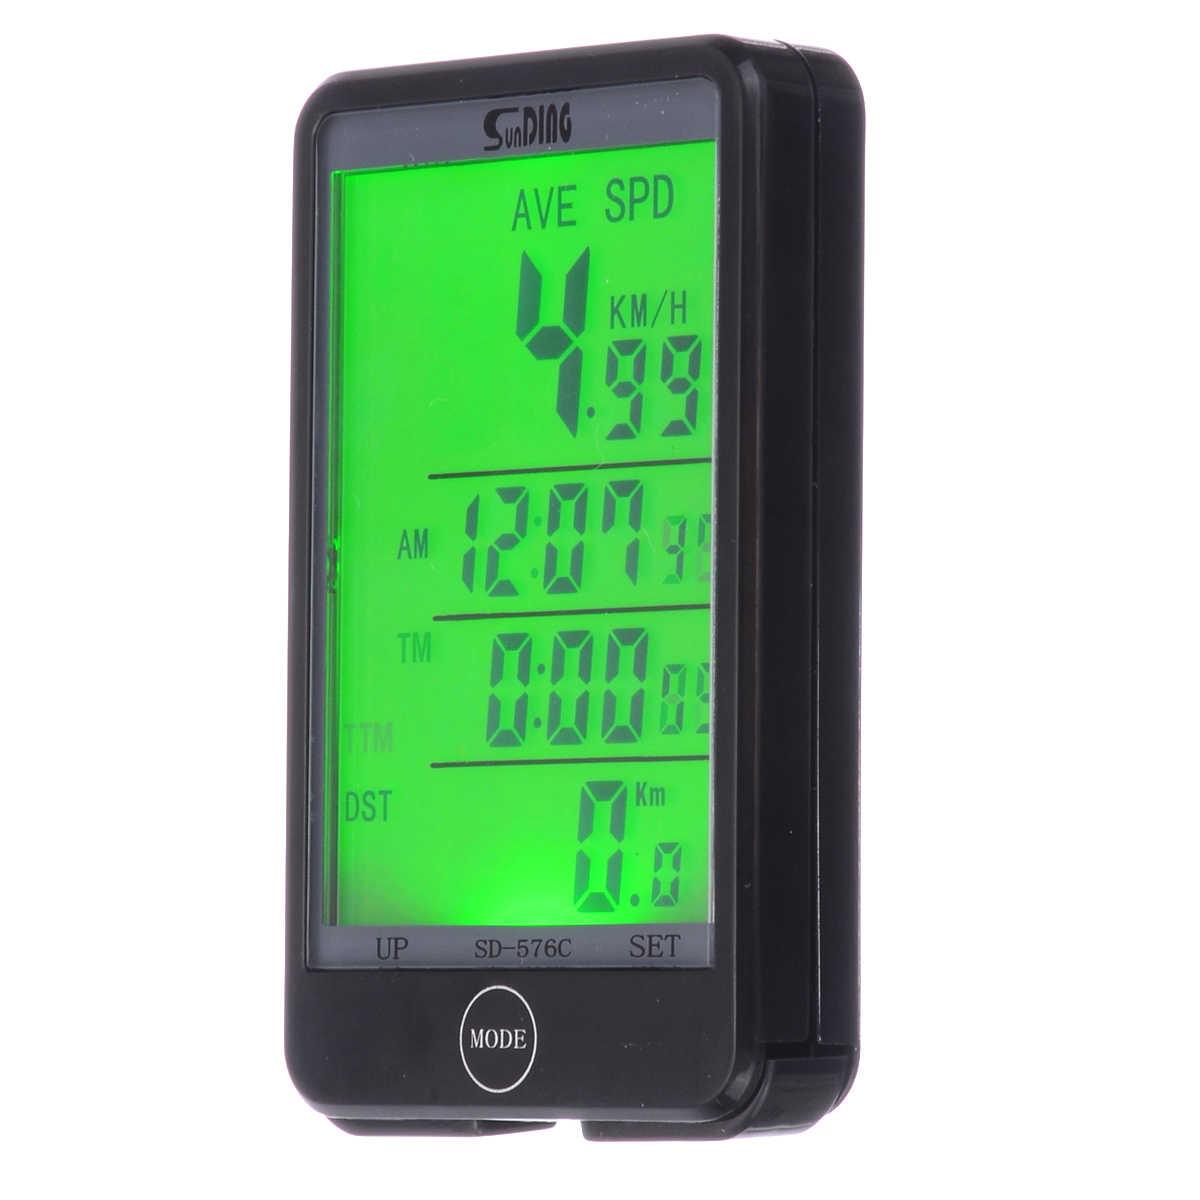 Inglês Digital LEVOU Luminosa noctilucentes Tabela de Códigos de Bicicleta À Prova D' Água Mountain Bike Sem Fio Velocímetro Luminosa